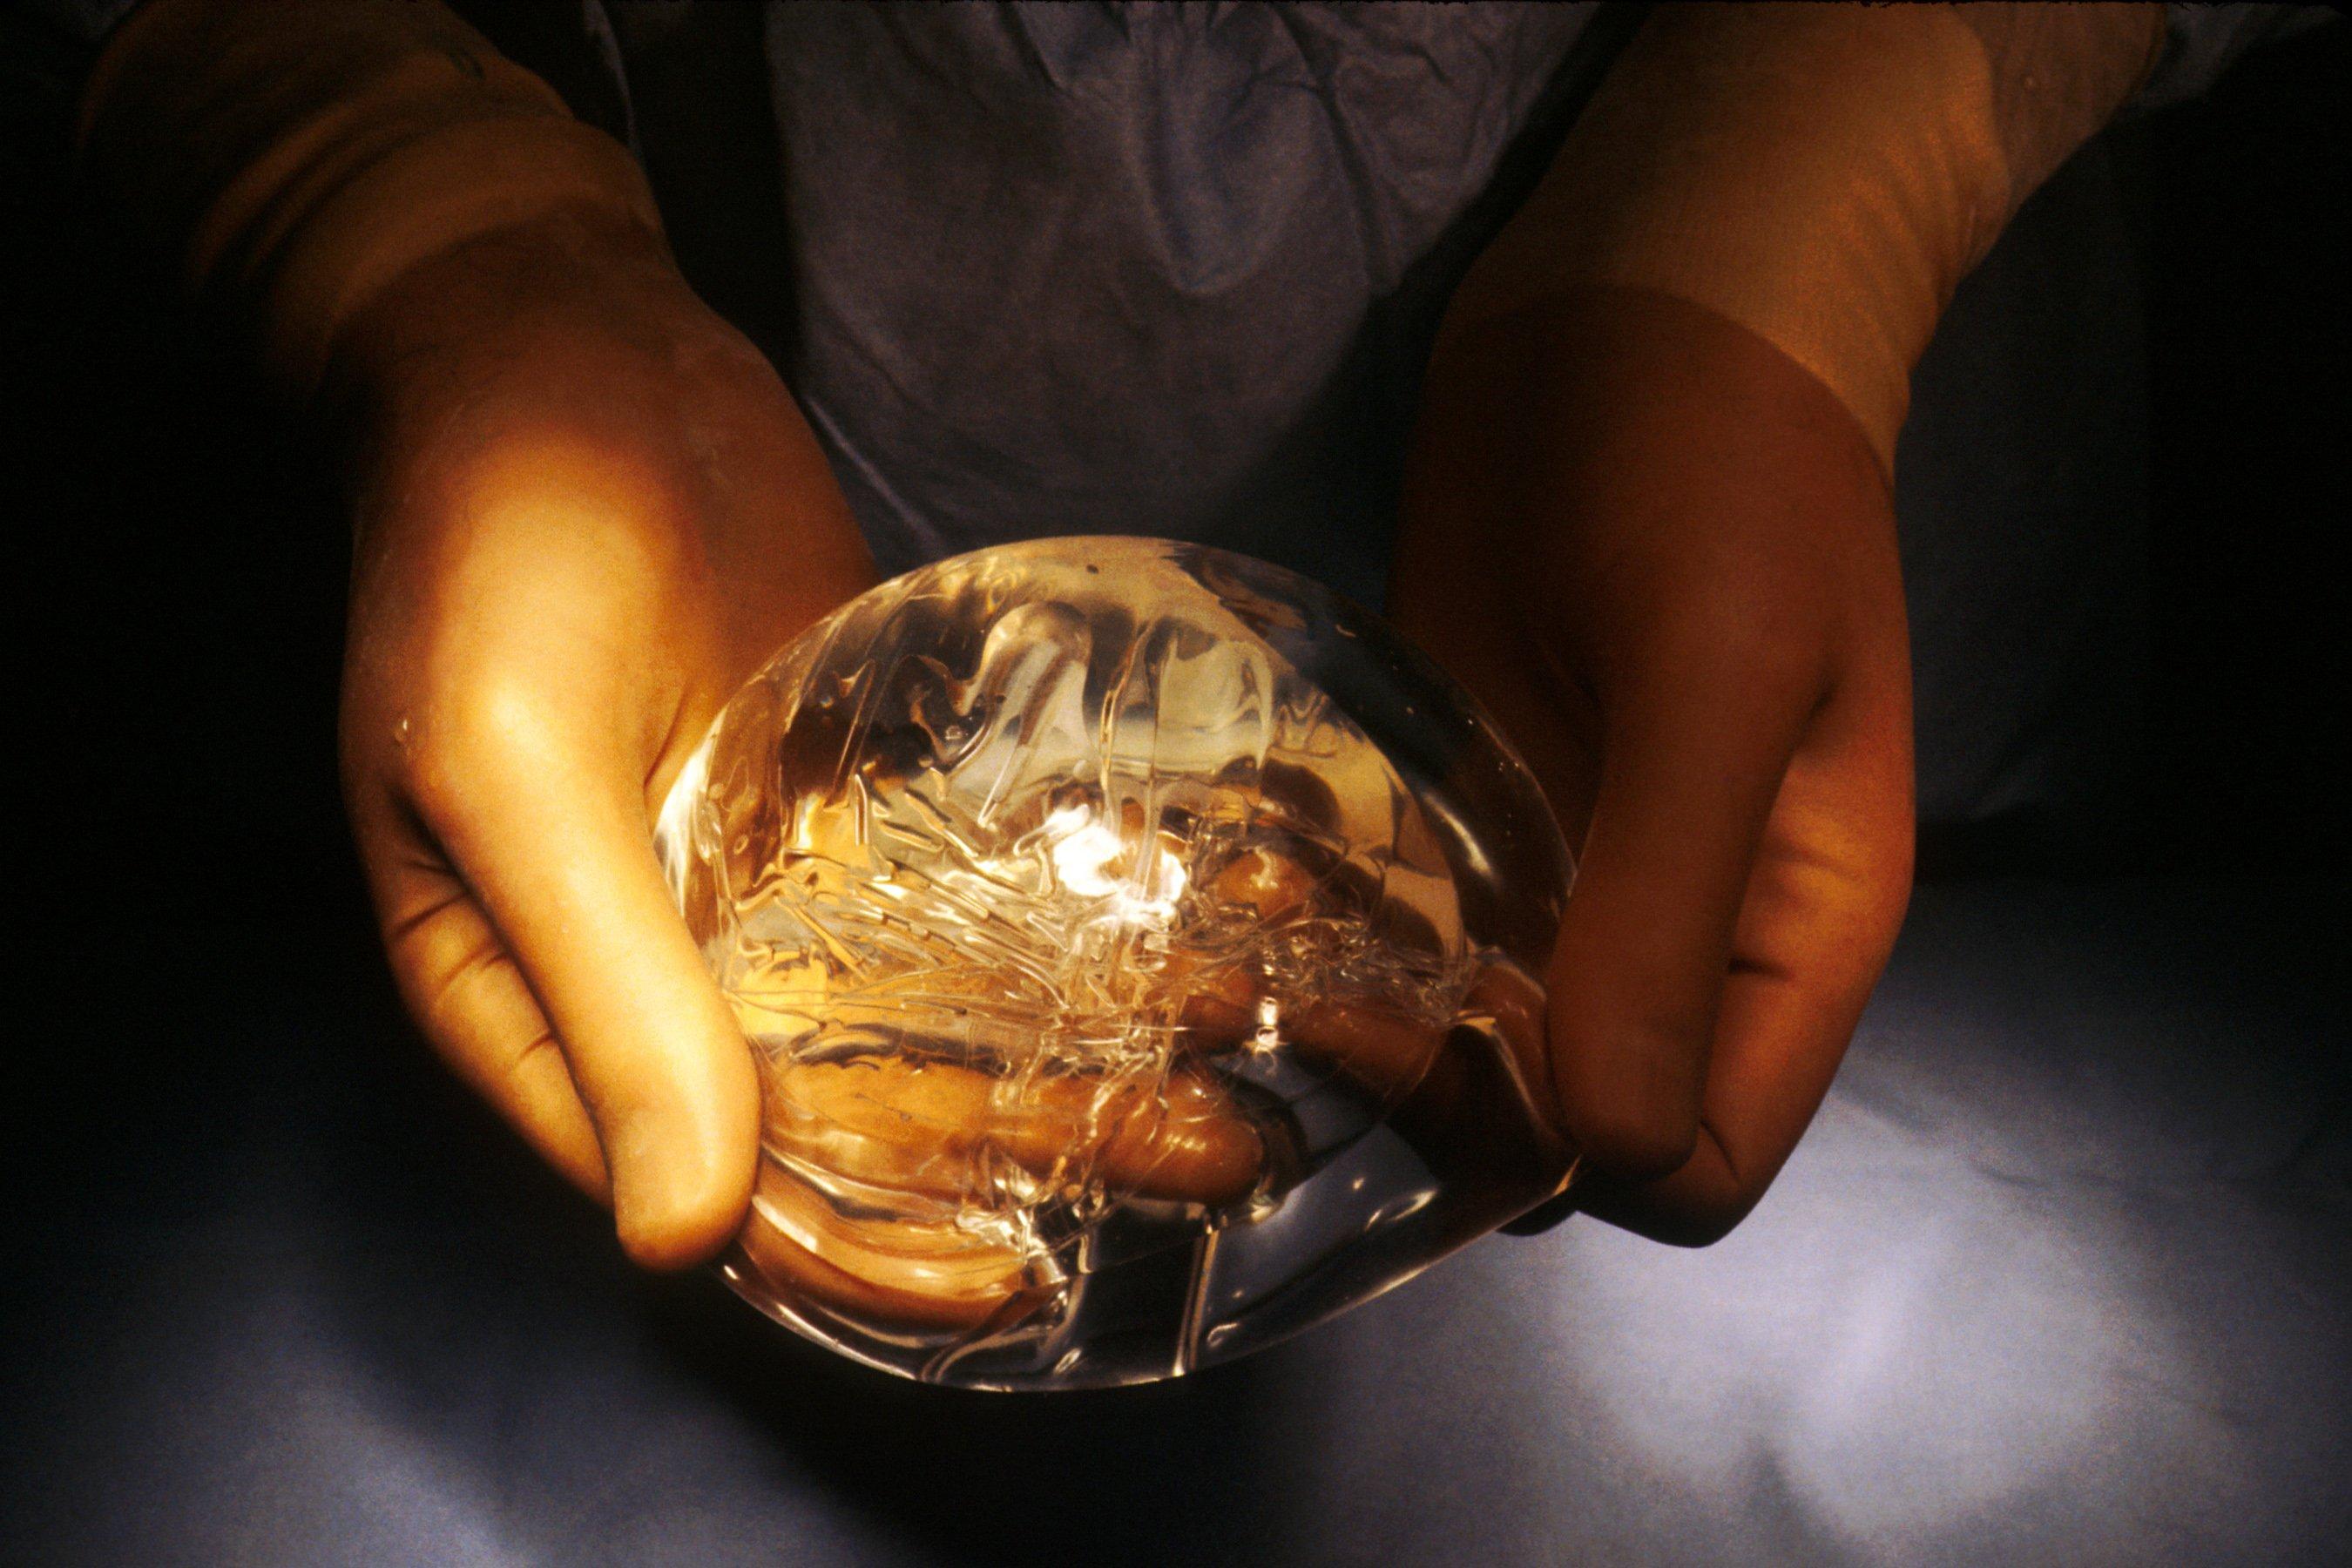 Image de l'implant mammaire | Image : Wikimedia Commons